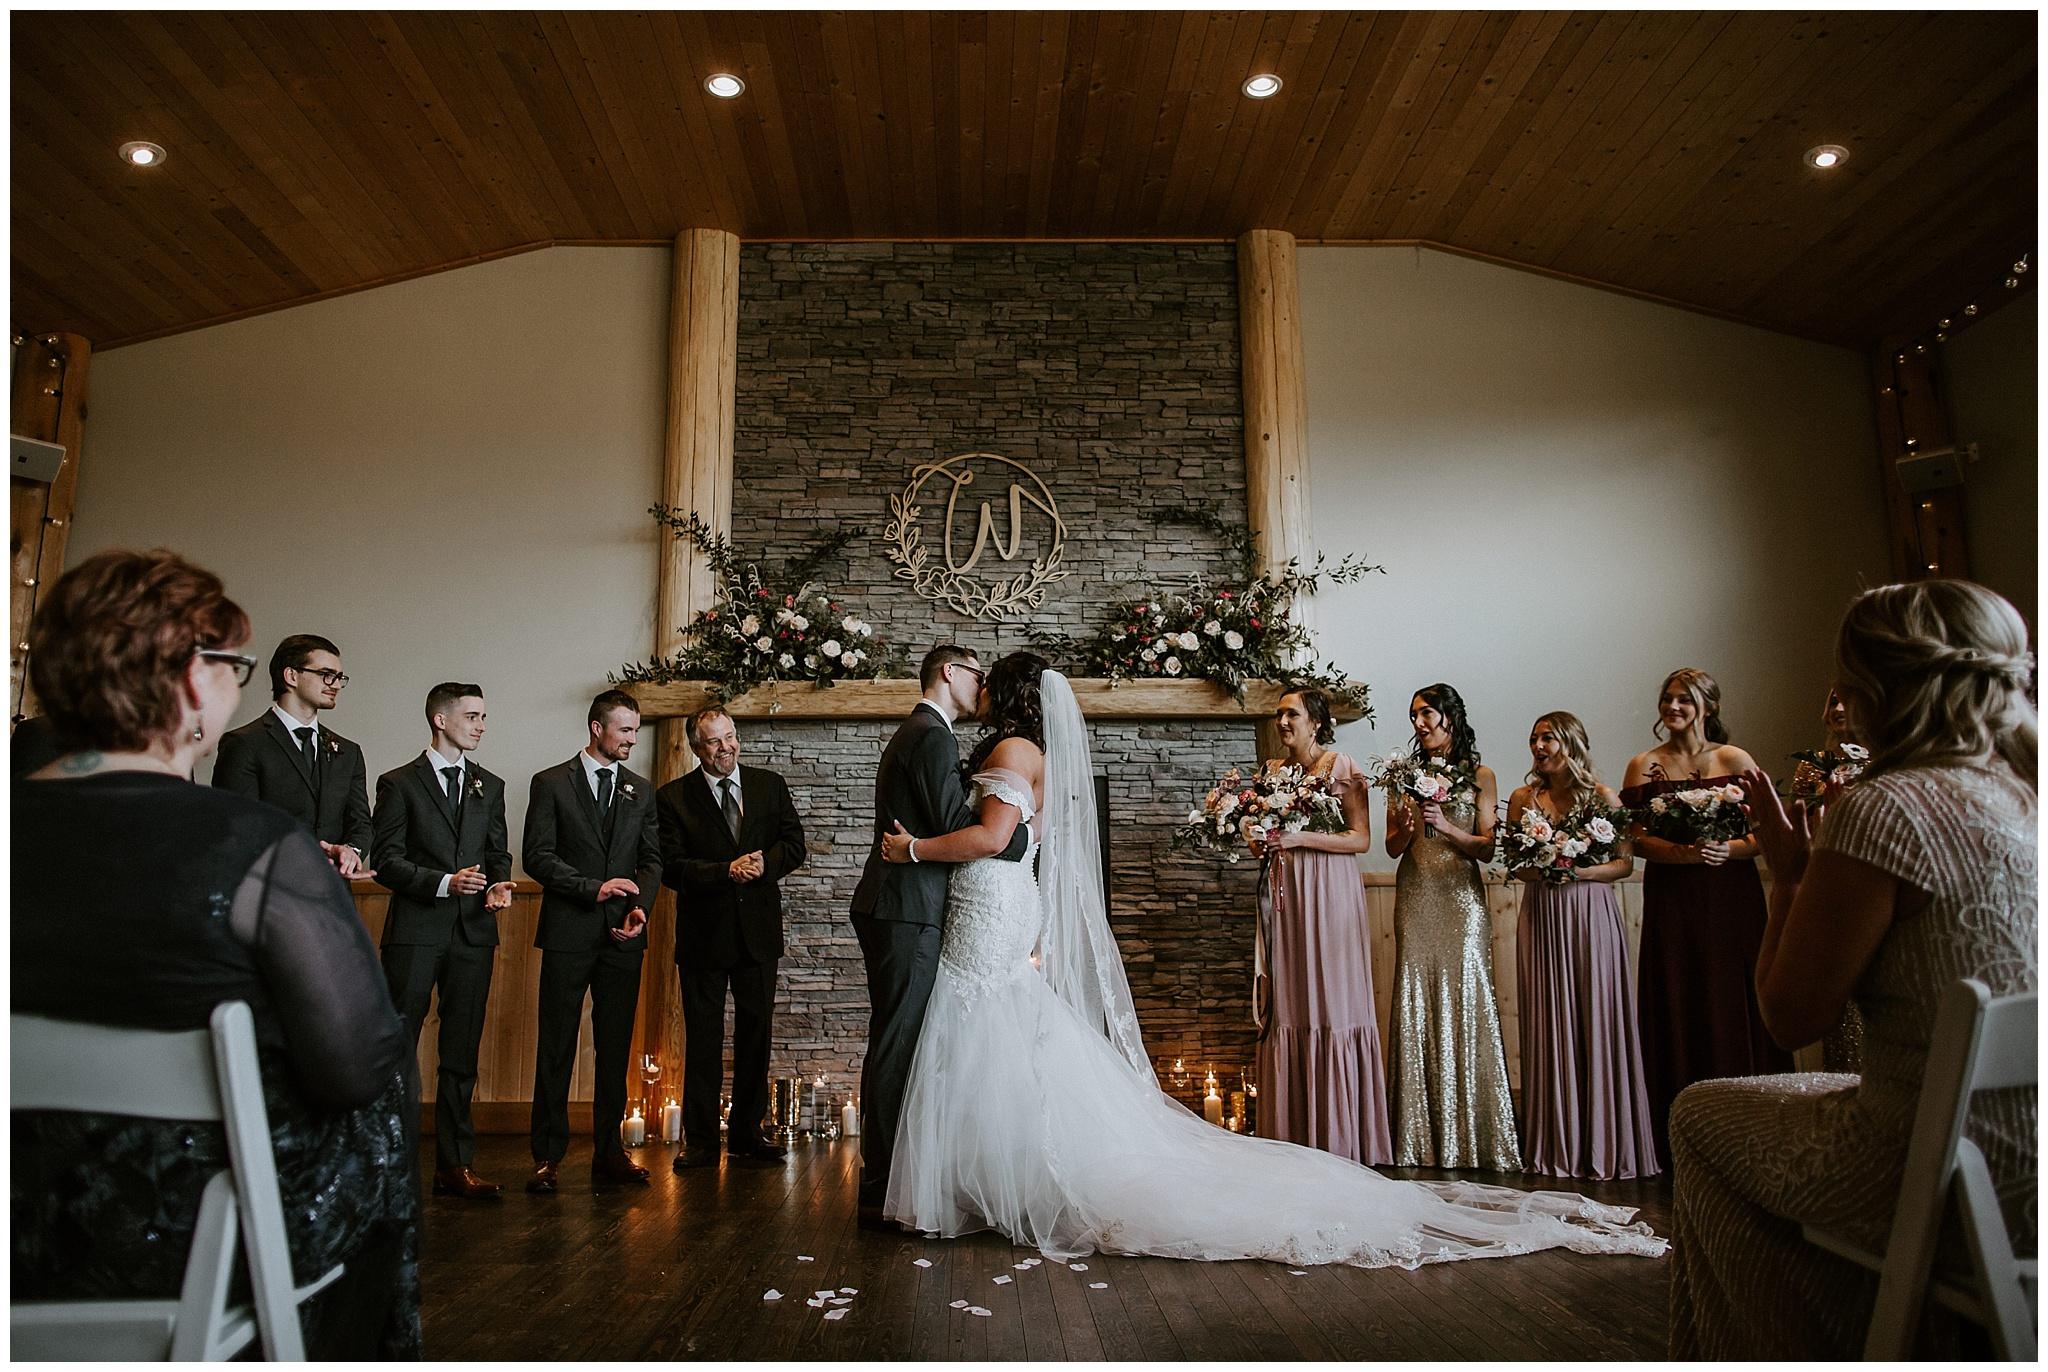 fraser-river-lodge-wedding-056.JPG